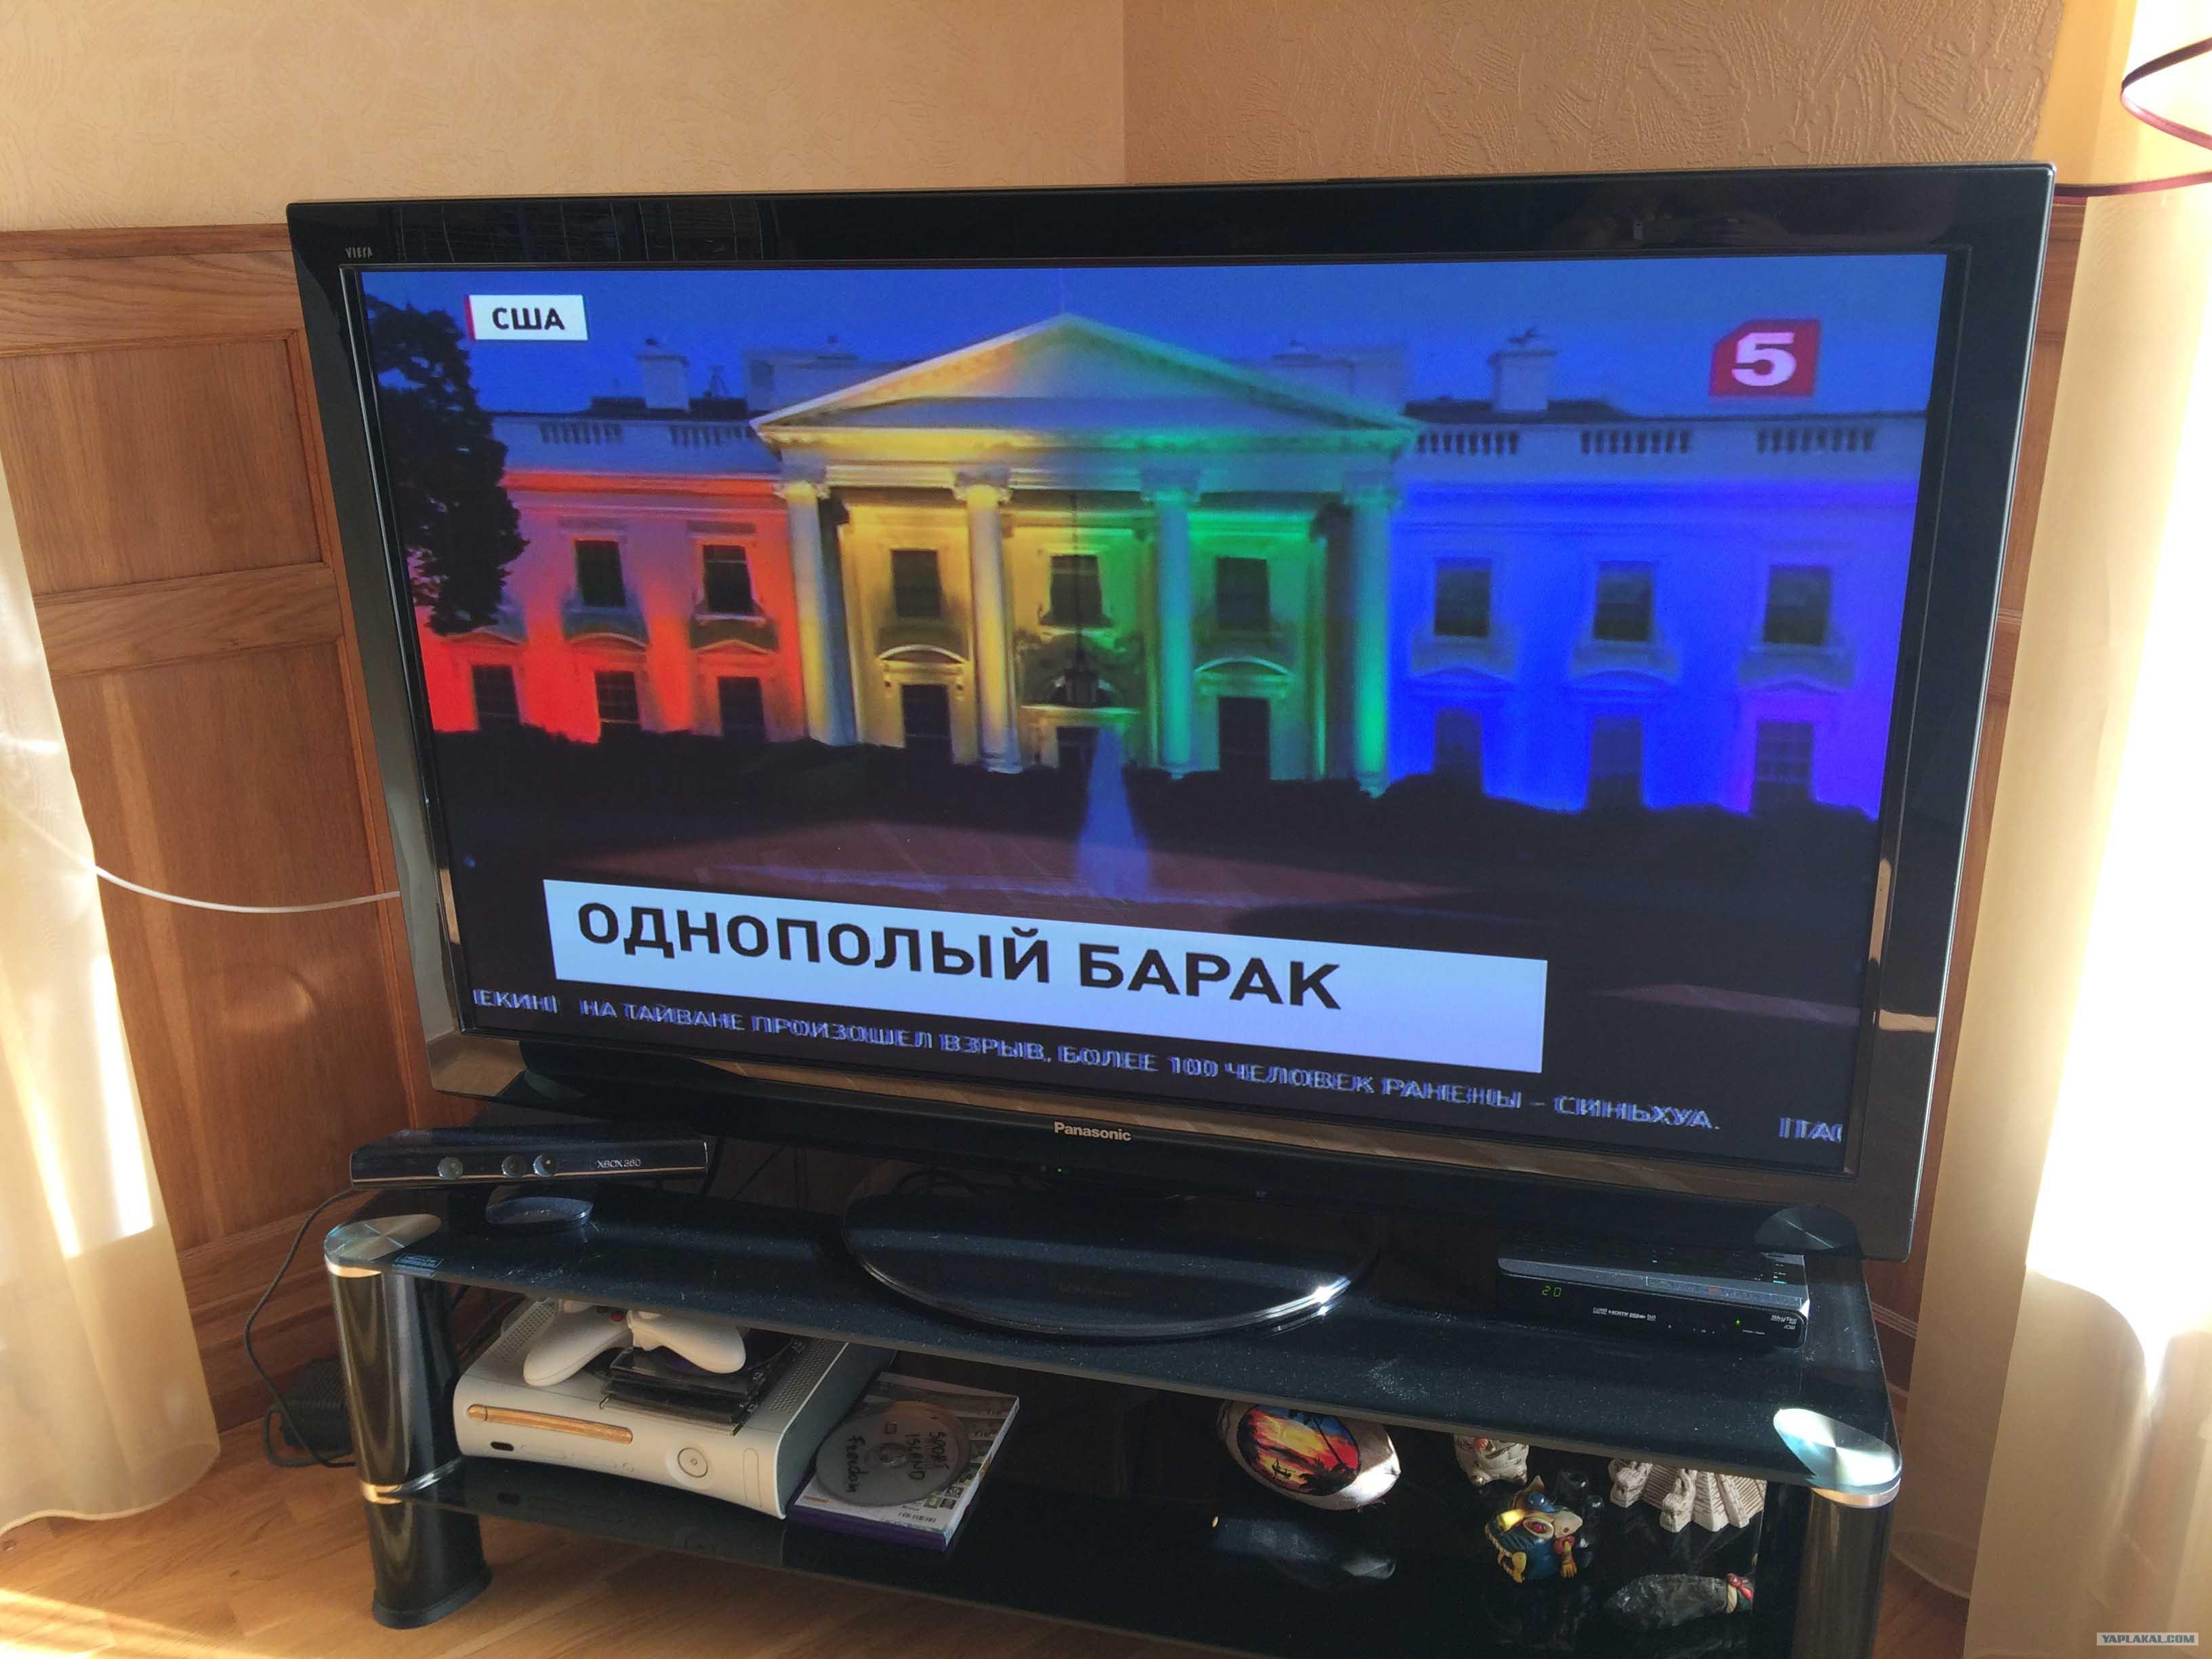 Новости челябинска онлайн отв